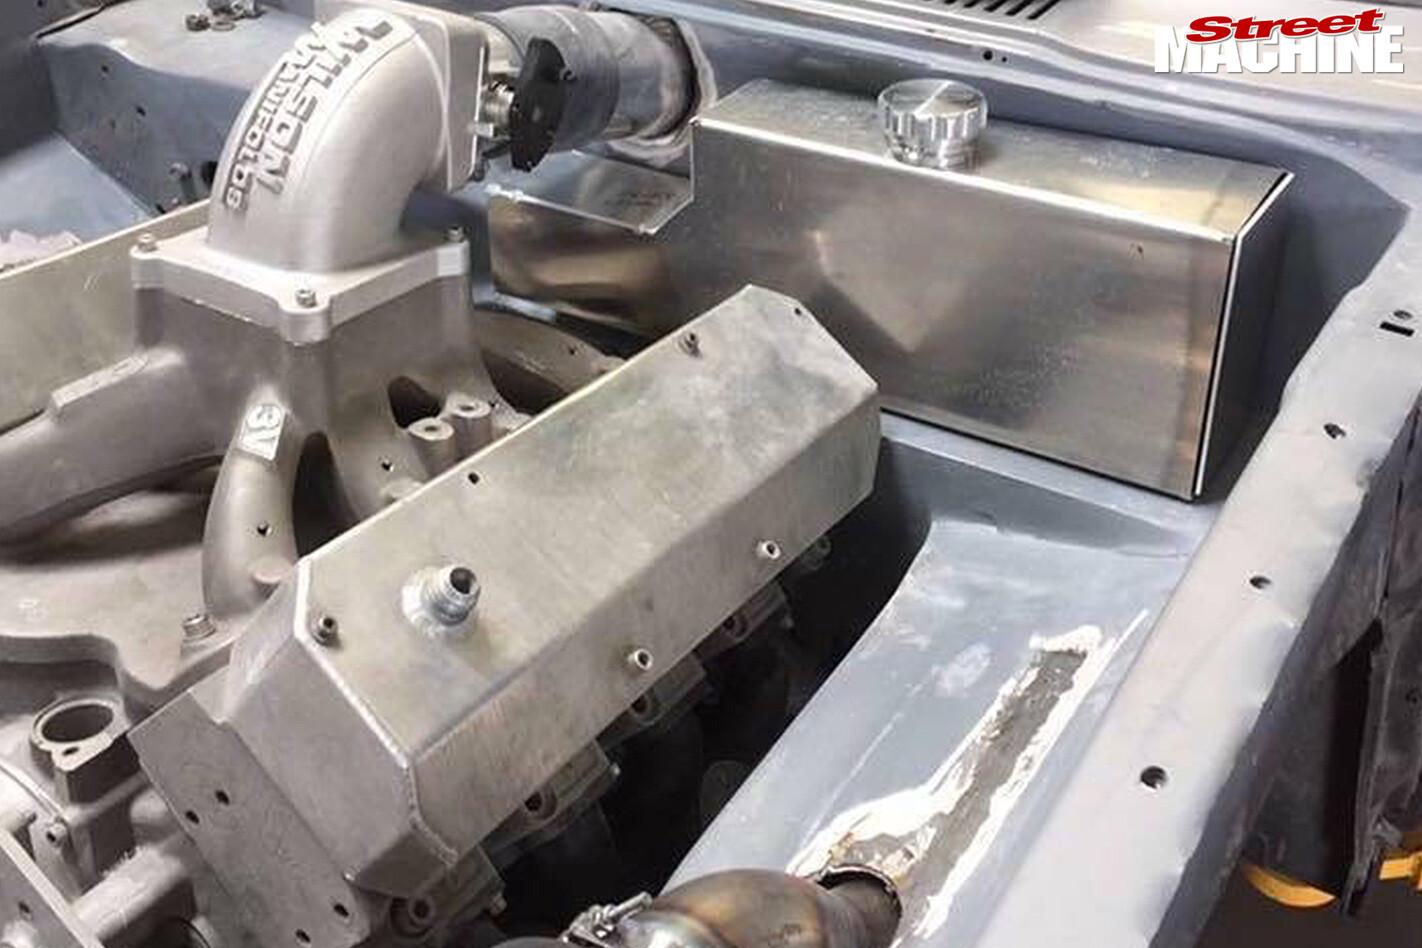 Ford TD Cortina engine bay